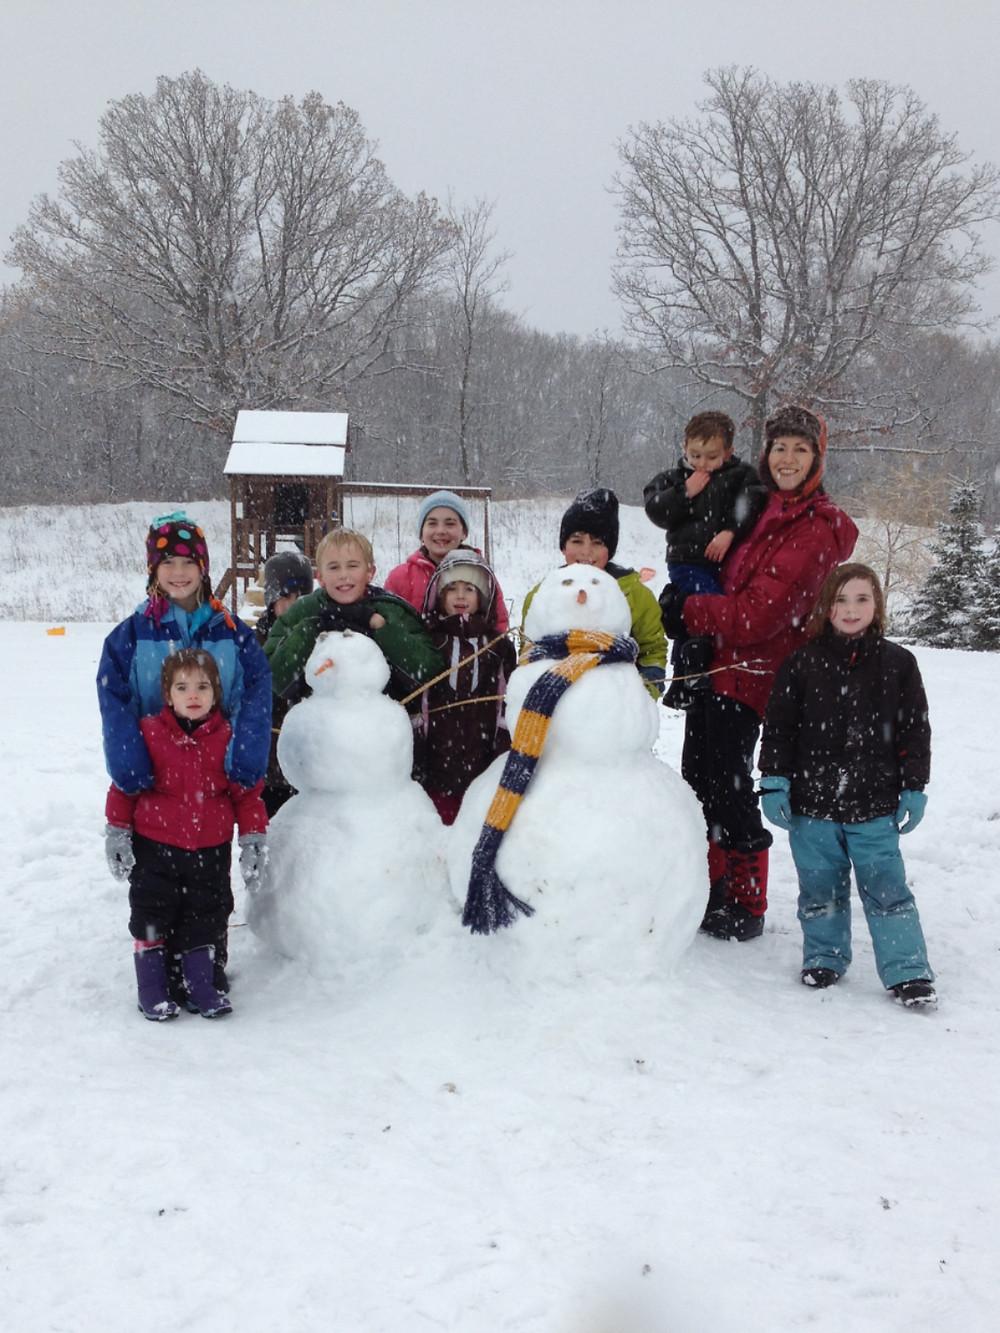 Snowmen Building with Friends